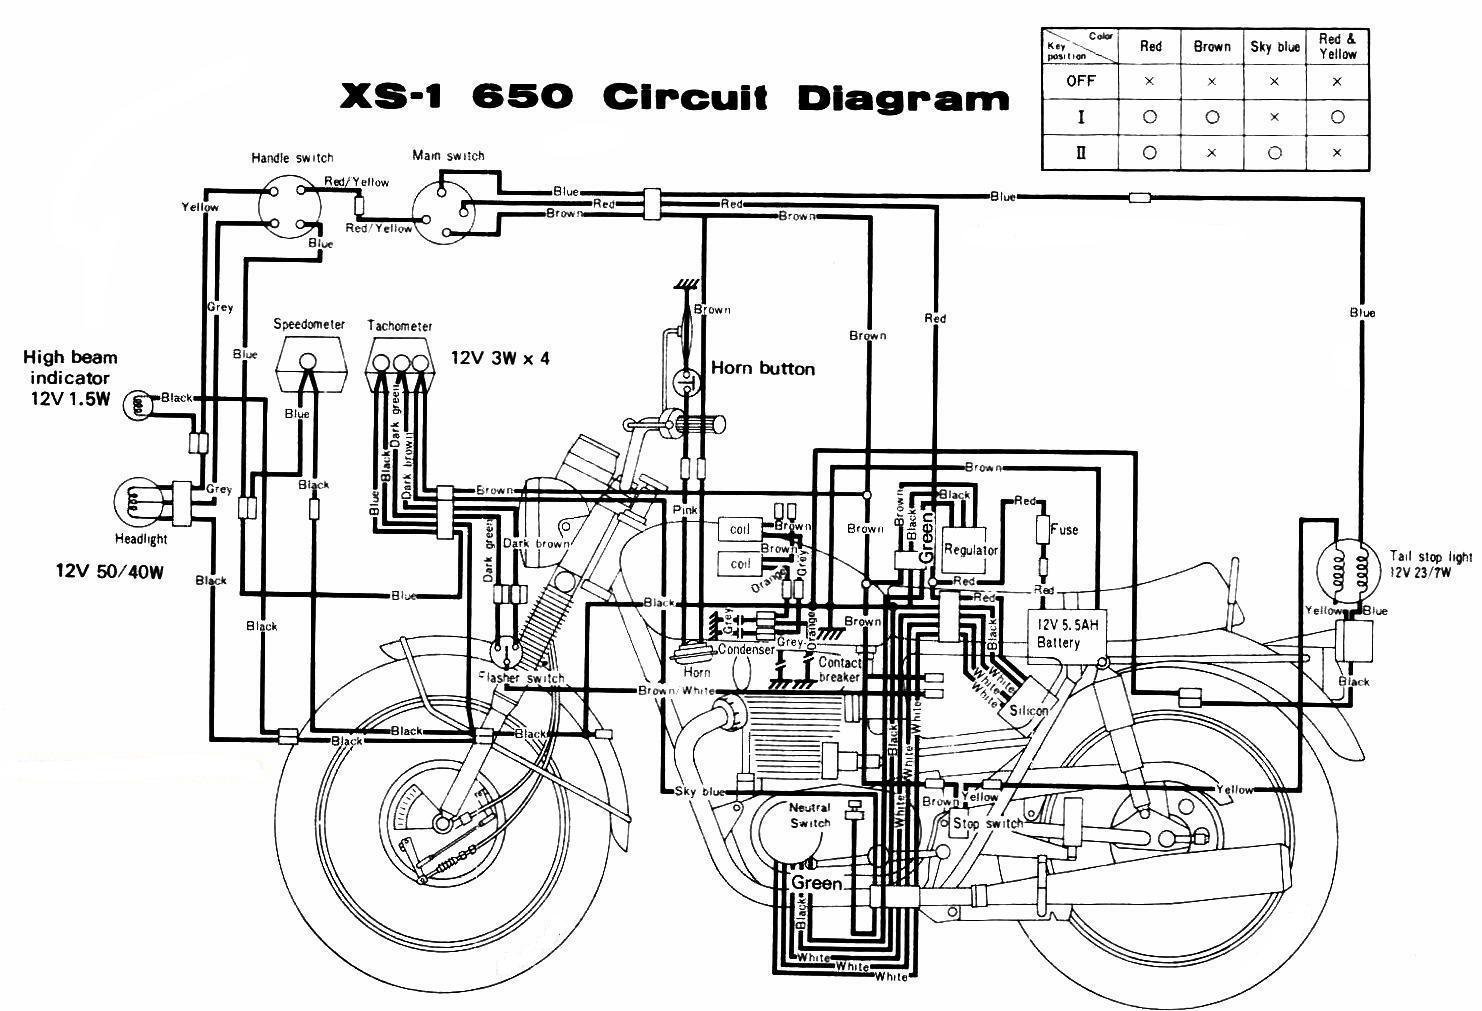 Surprising Honda Motorcycle Wiring Diagrams Basic Electronics Wiring Diagram Wiring Cloud Cranvenetmohammedshrineorg